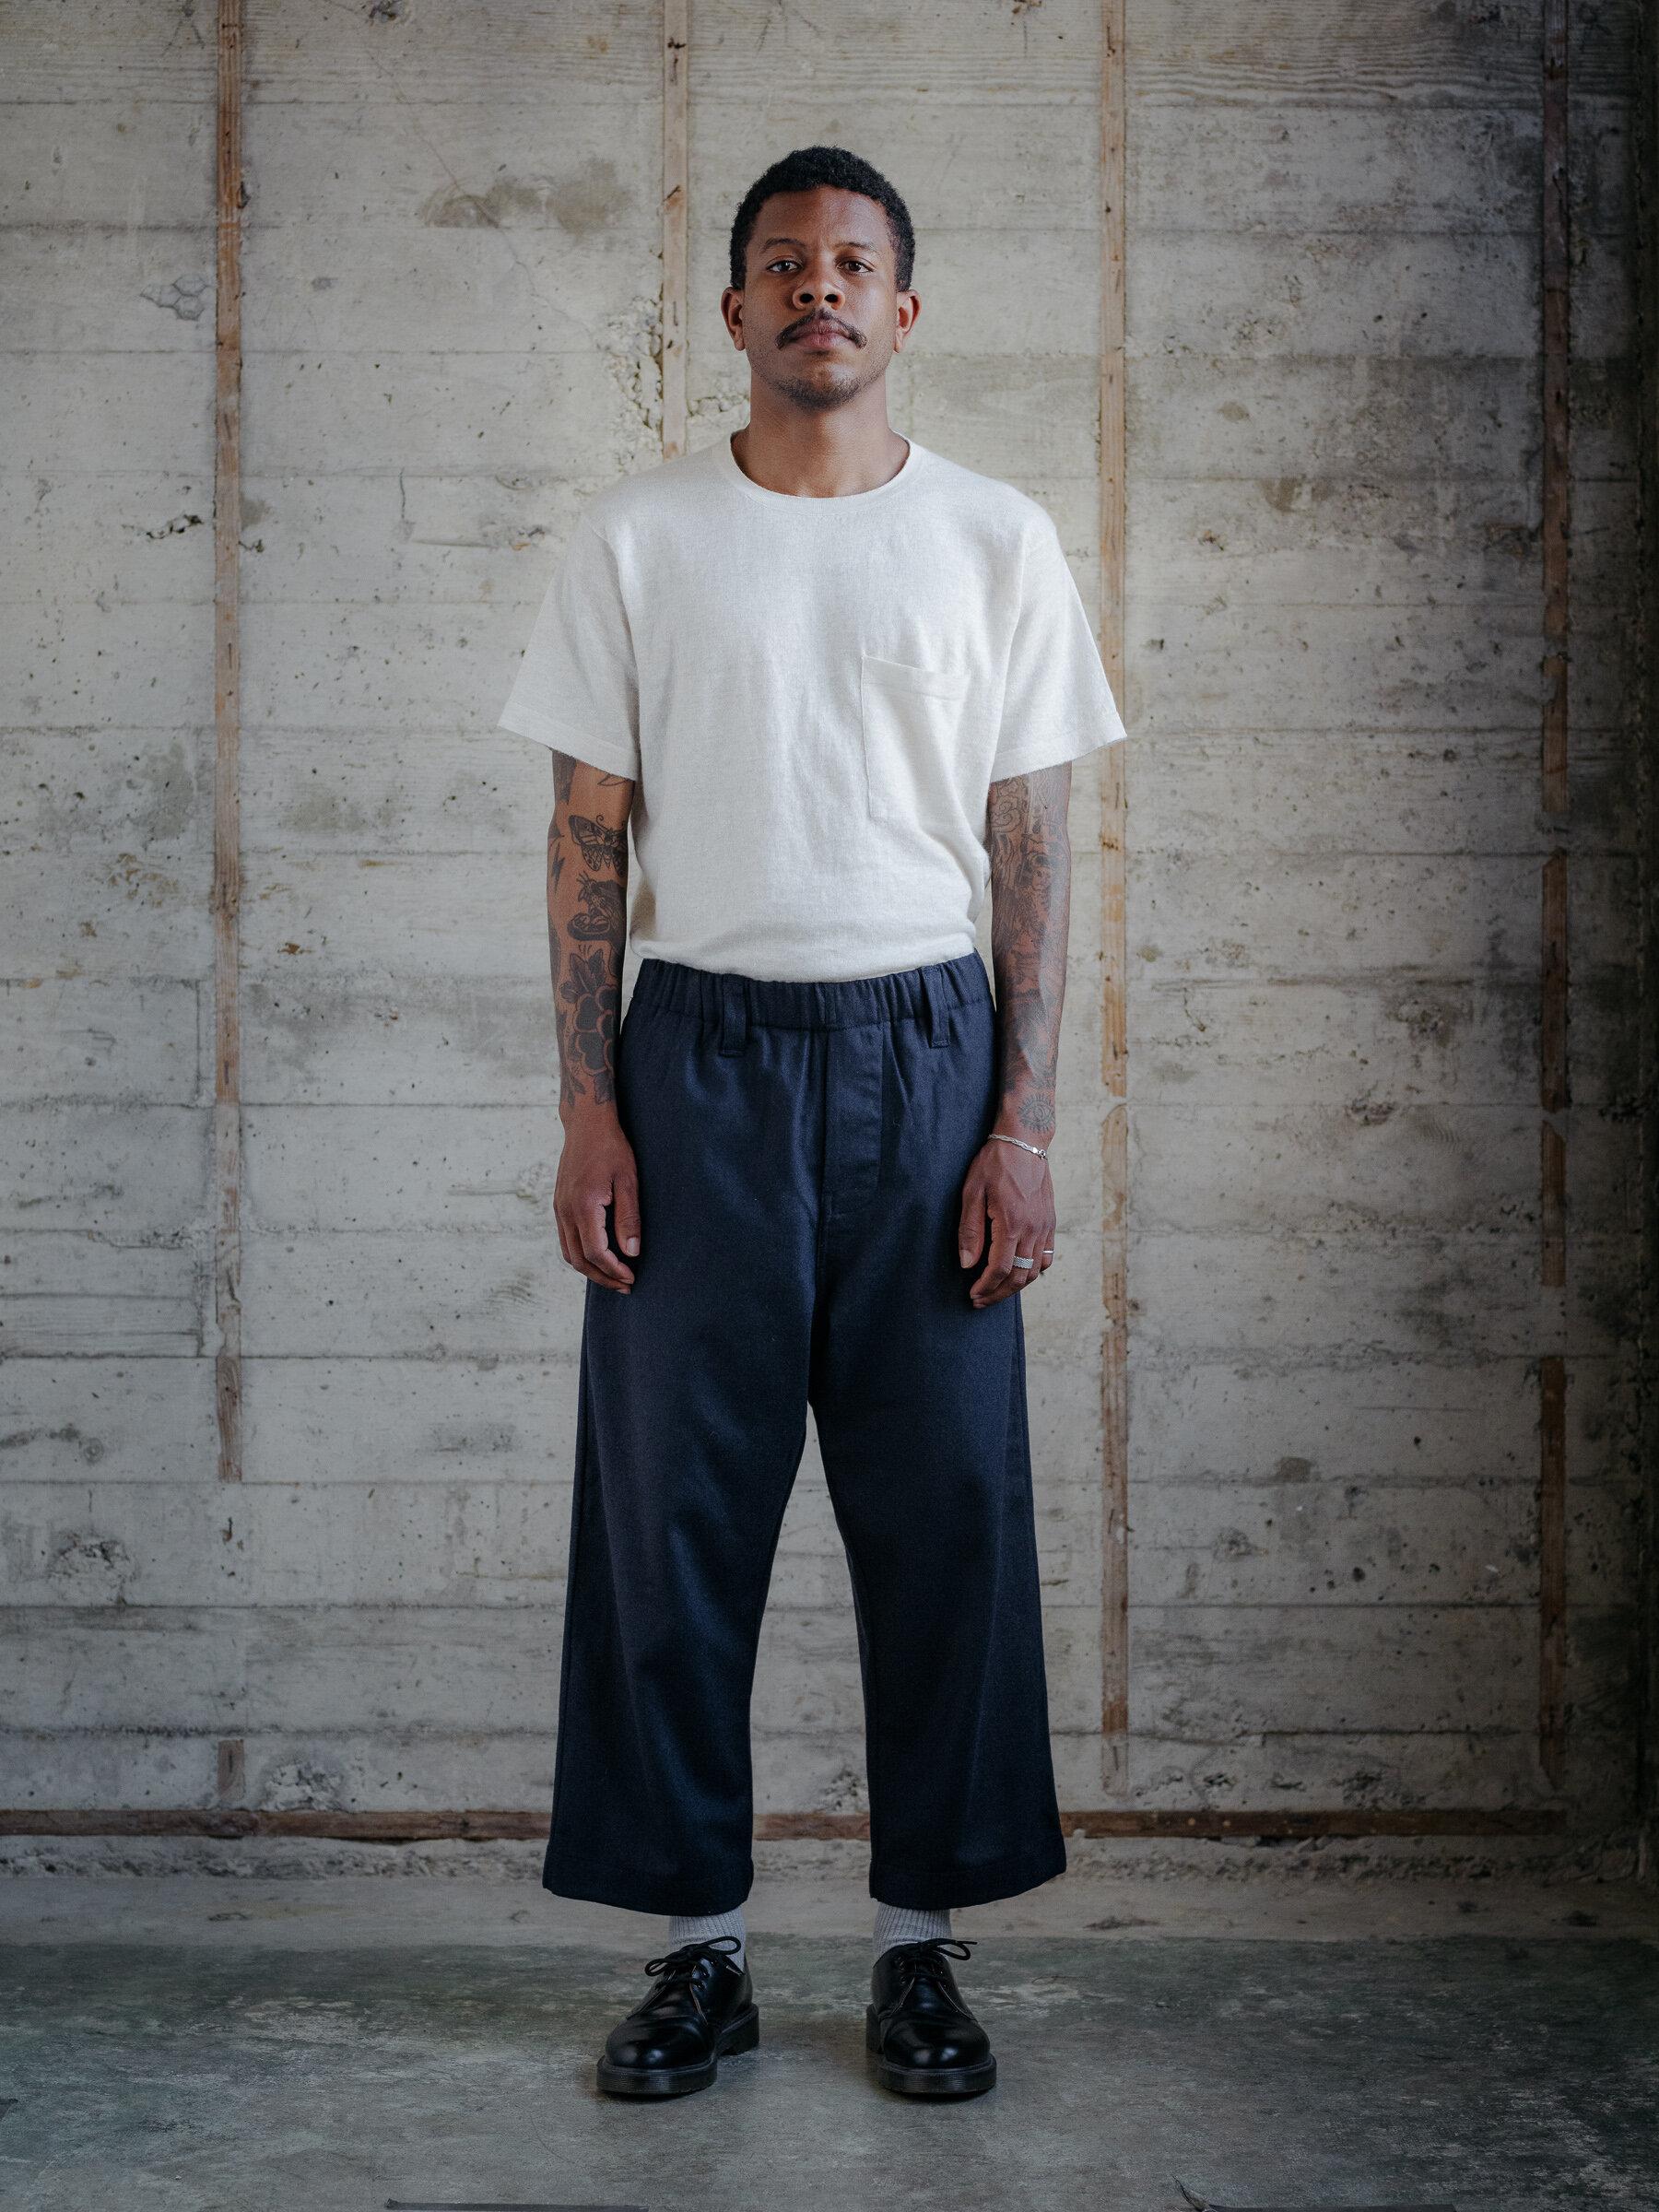 evan-kinori-elastic-pant-cashmere-lambswool-woven-in-england-made-in-san-francisco-1